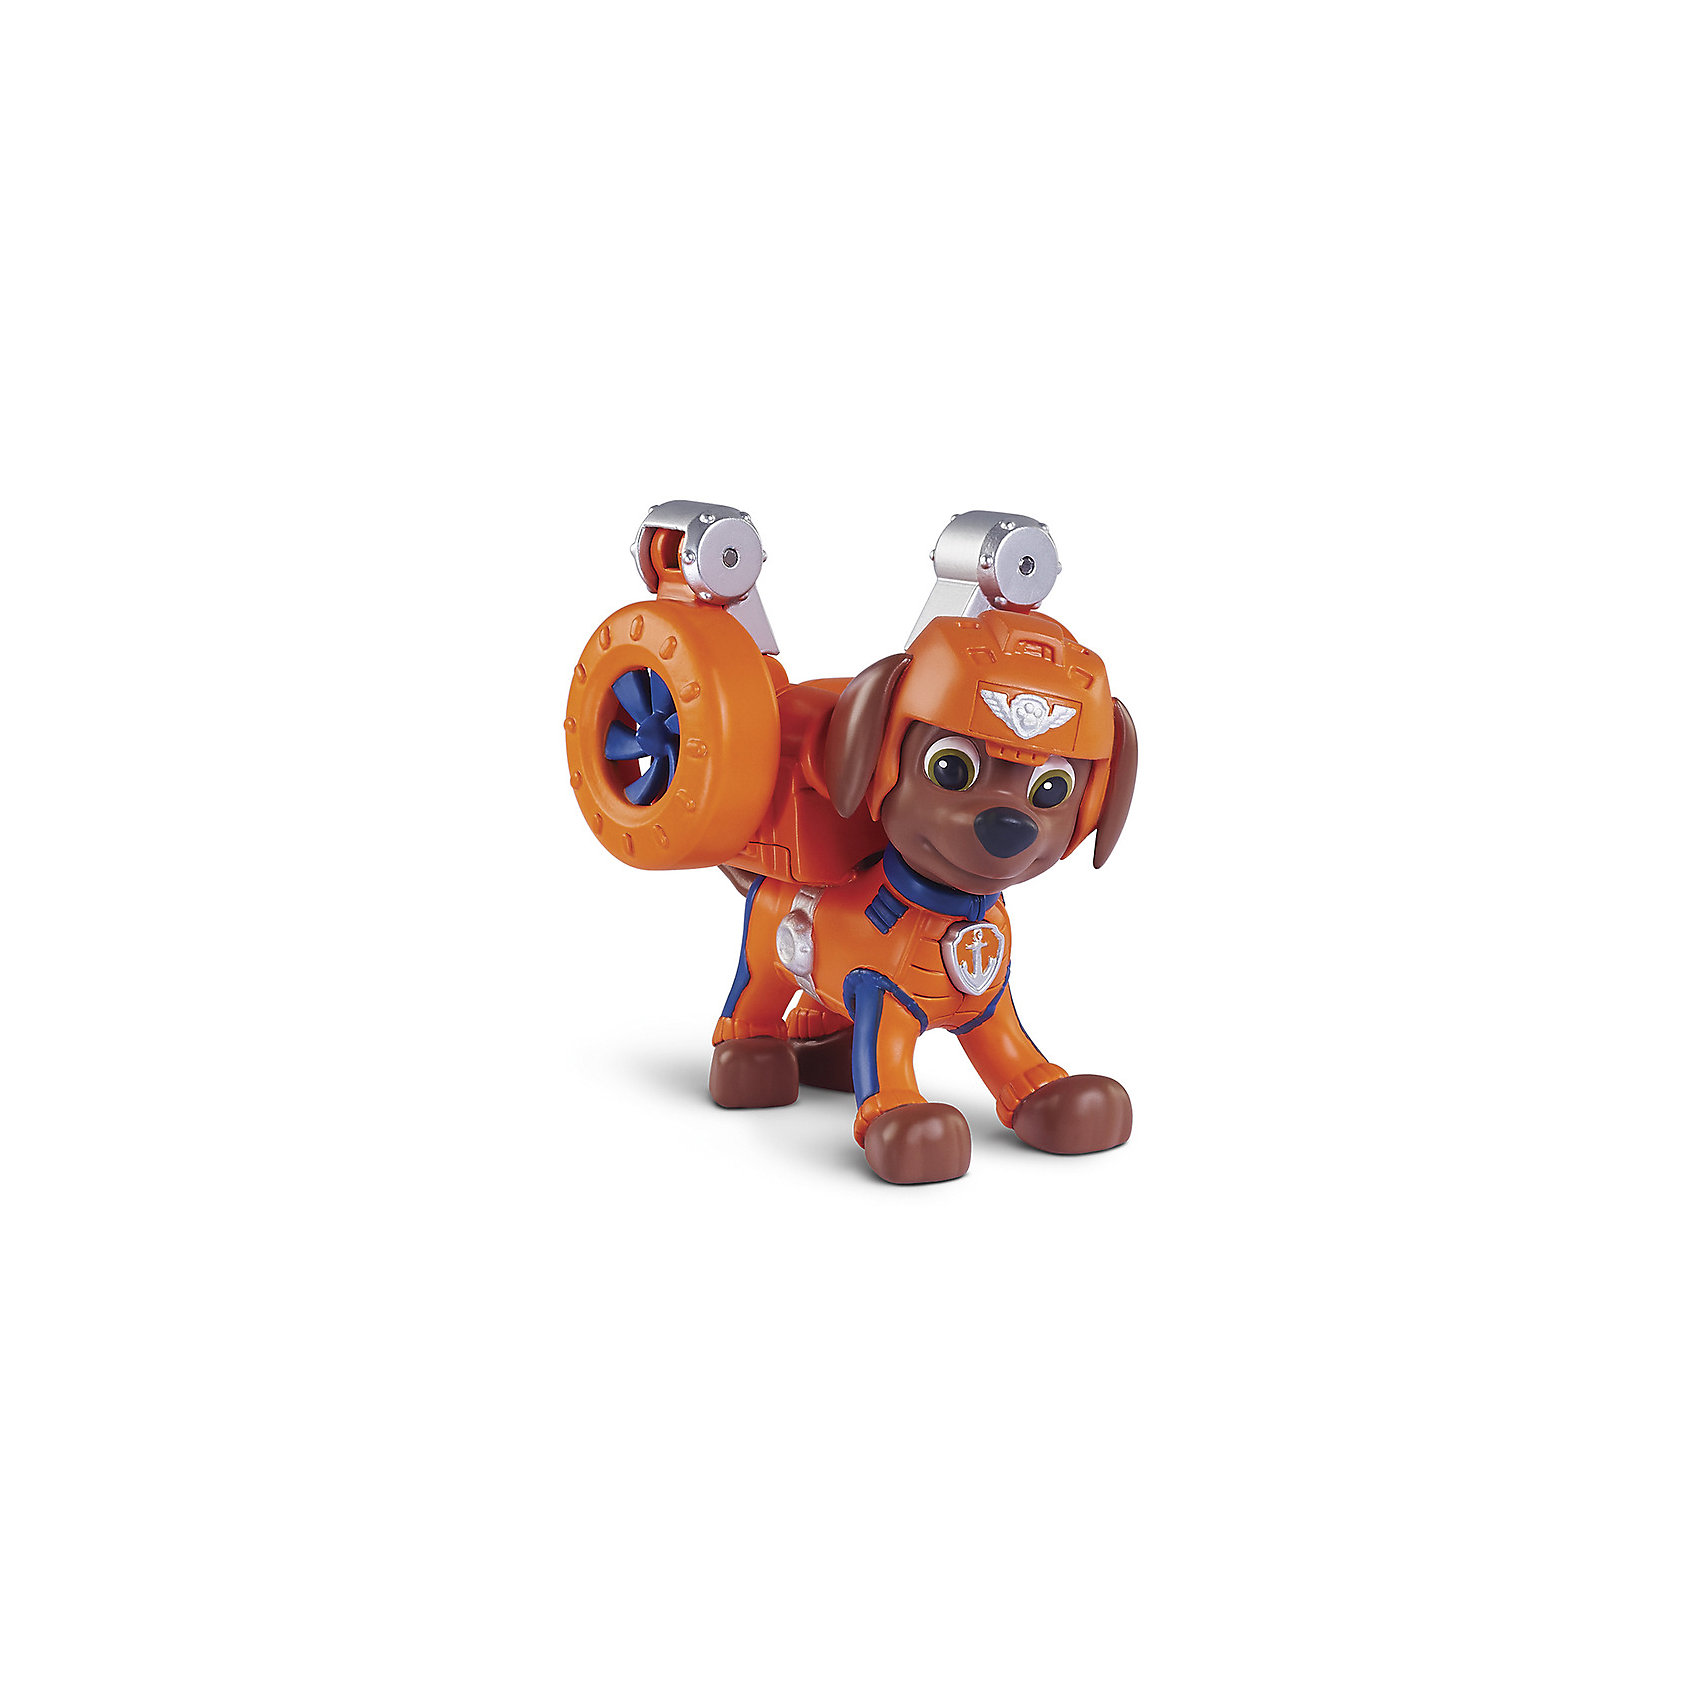 Spin Master Фигурка воздушного спасателя Зума, Щенячий Патруль spin master фигурка спасателя с рюкзаком трансформером рокки щенячий патруль spin master